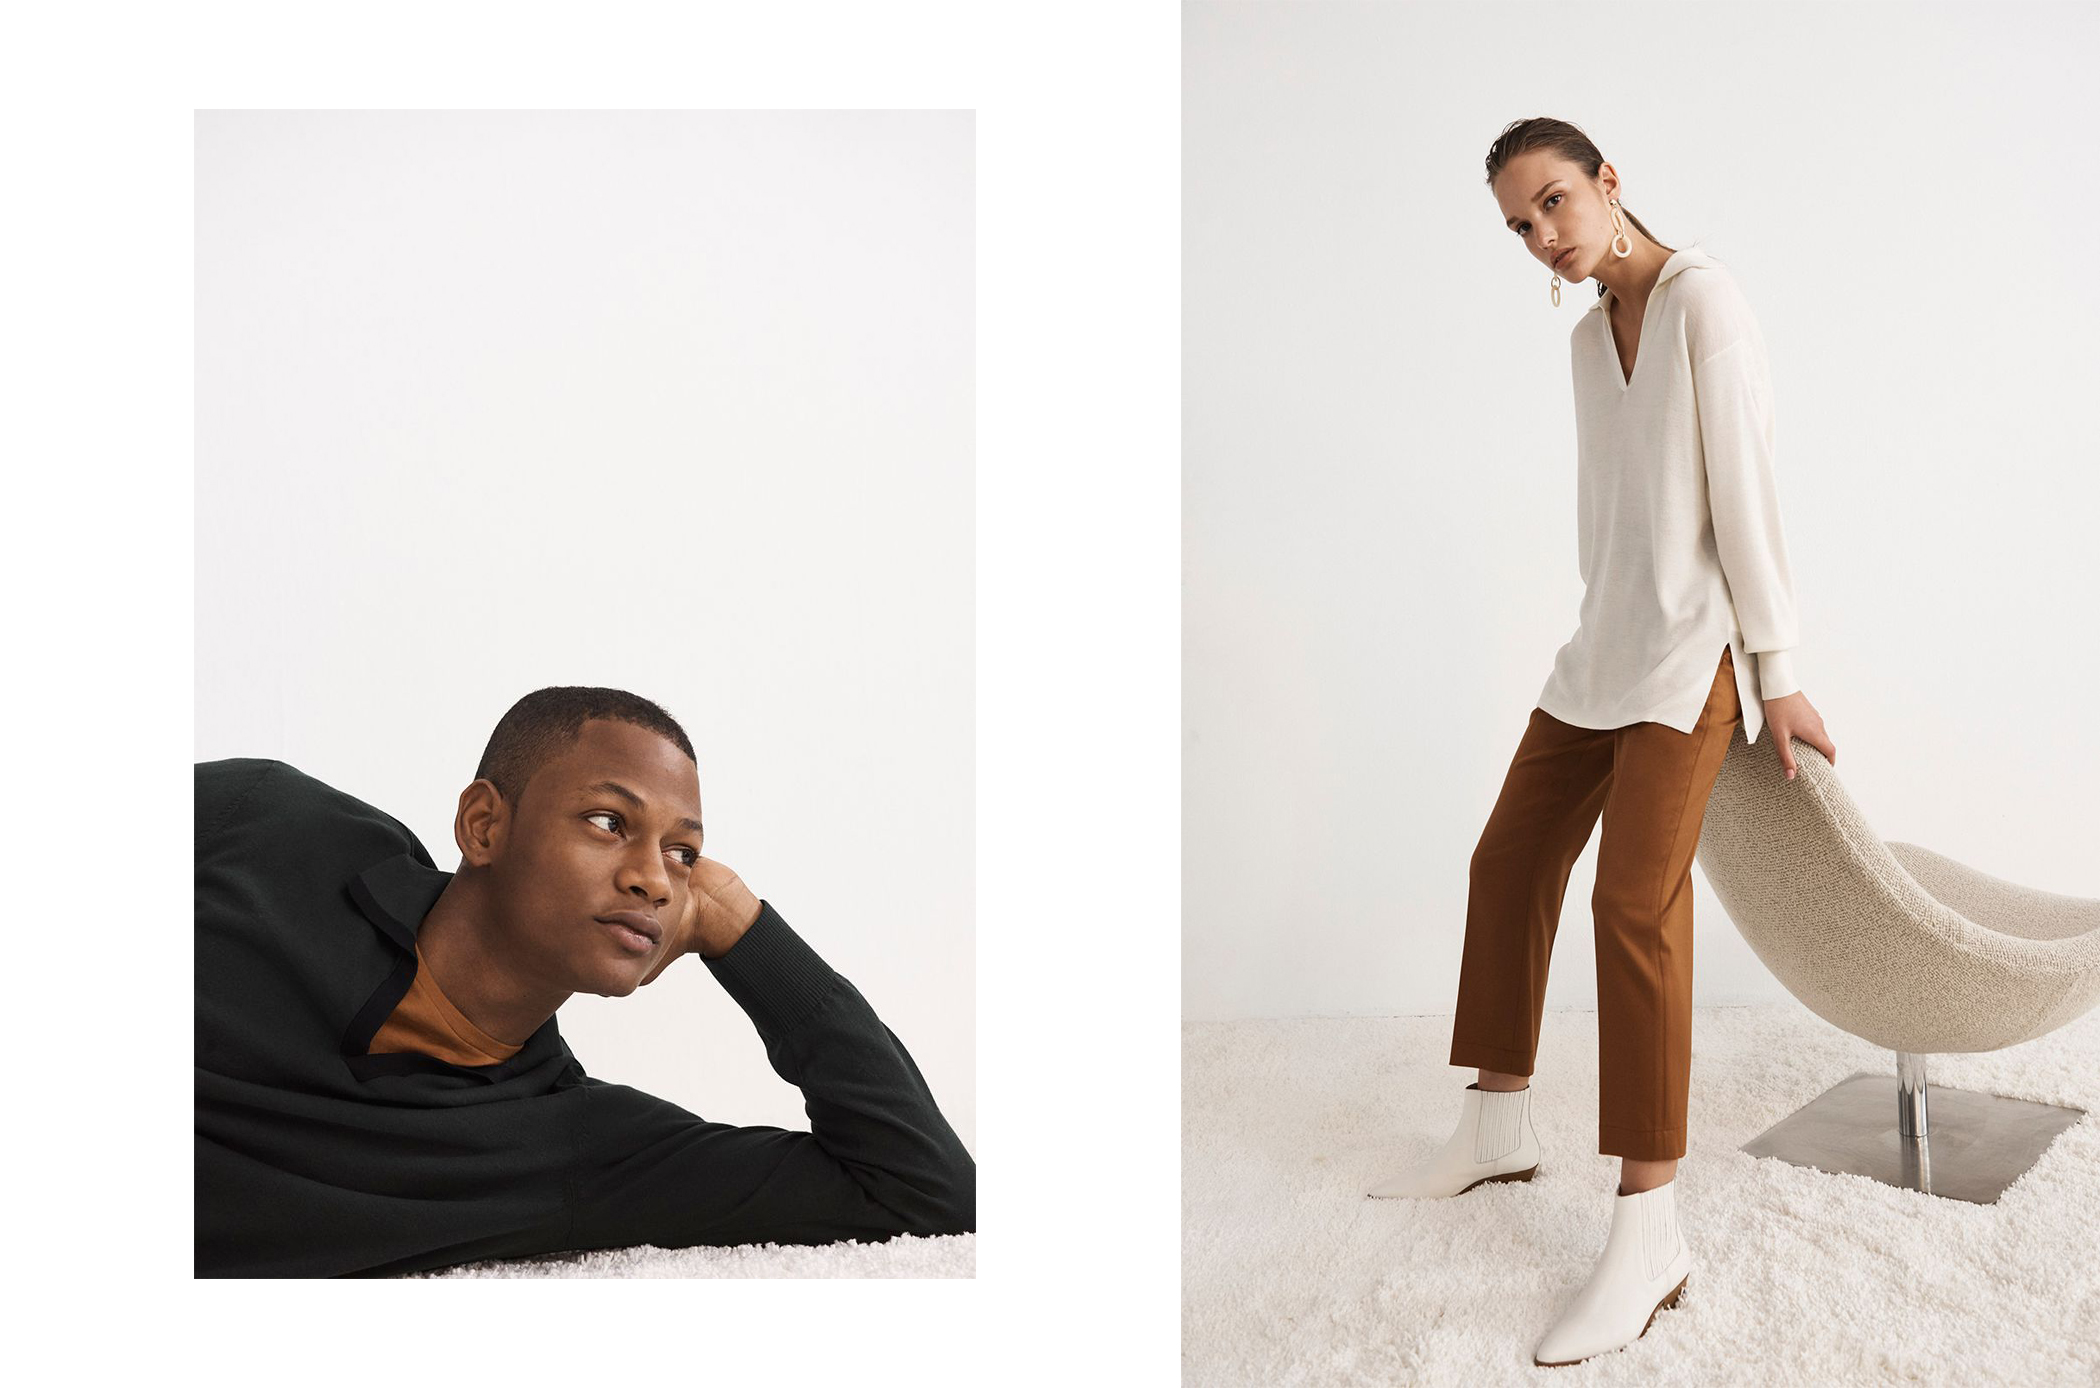 Johnny Collar Polo, Williams Pocket Crew Pullover / Dahlja Sweater, Fayhe Pant